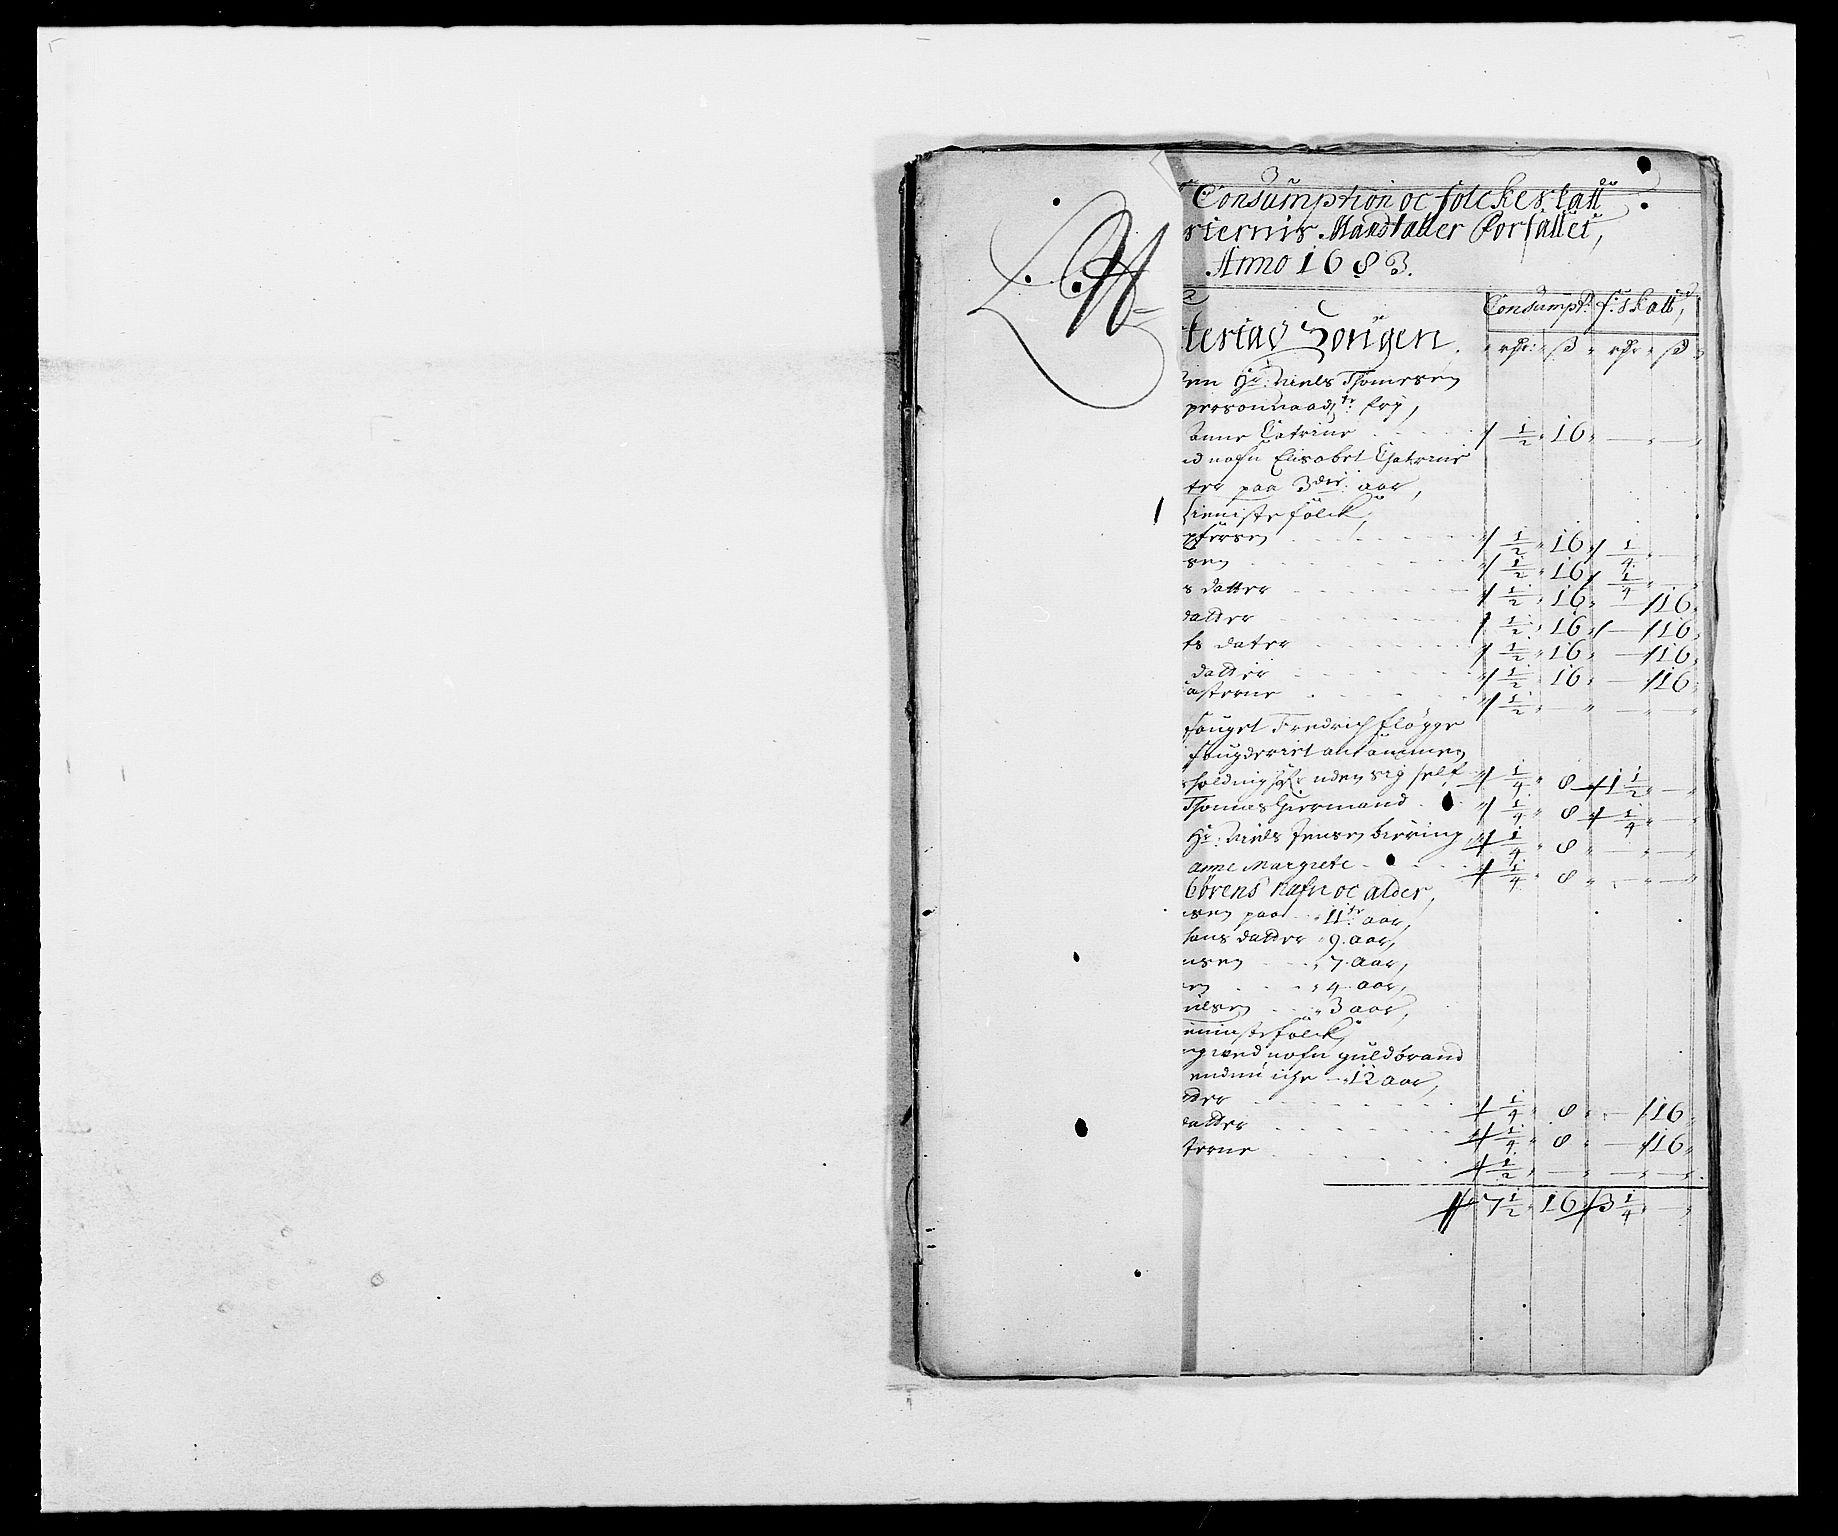 RA, Rentekammeret inntil 1814, Reviderte regnskaper, Fogderegnskap, R05/L0274: Fogderegnskap Rakkestad, 1683-1684, s. 166